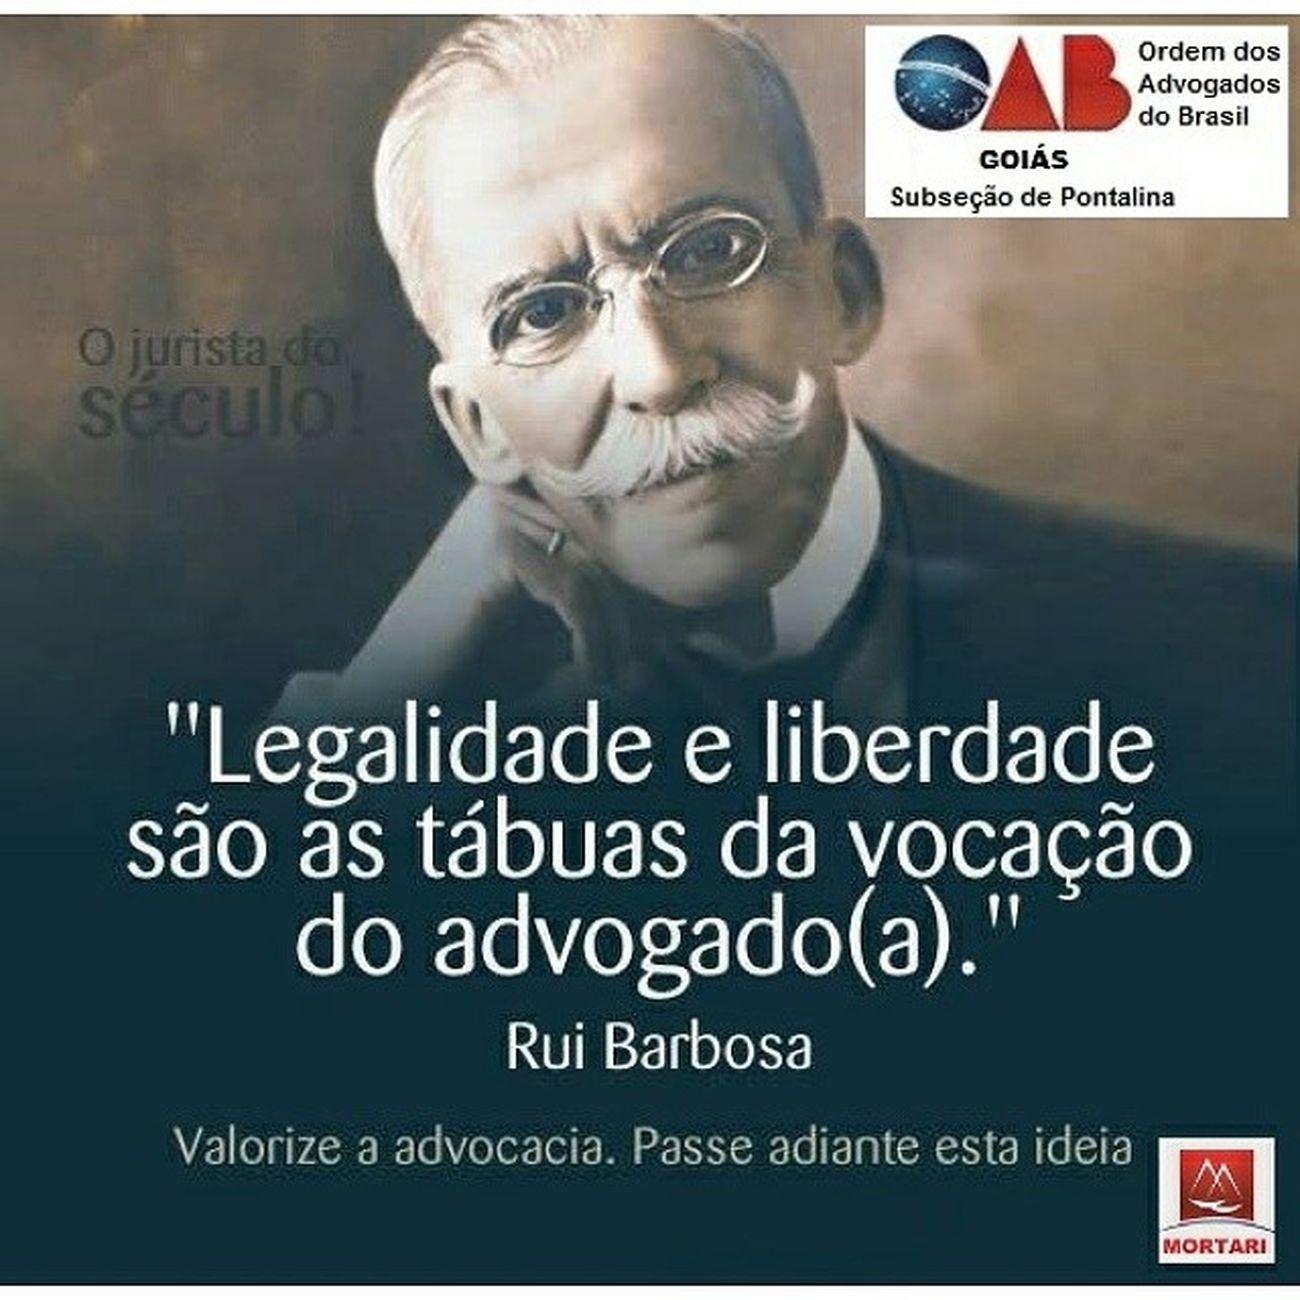 Advogado Advocacia Oab Oabgo consultesempreumadvogado valorizeaadvocacia passeadianteessaideia www.facebook.com/MortariAdvogados